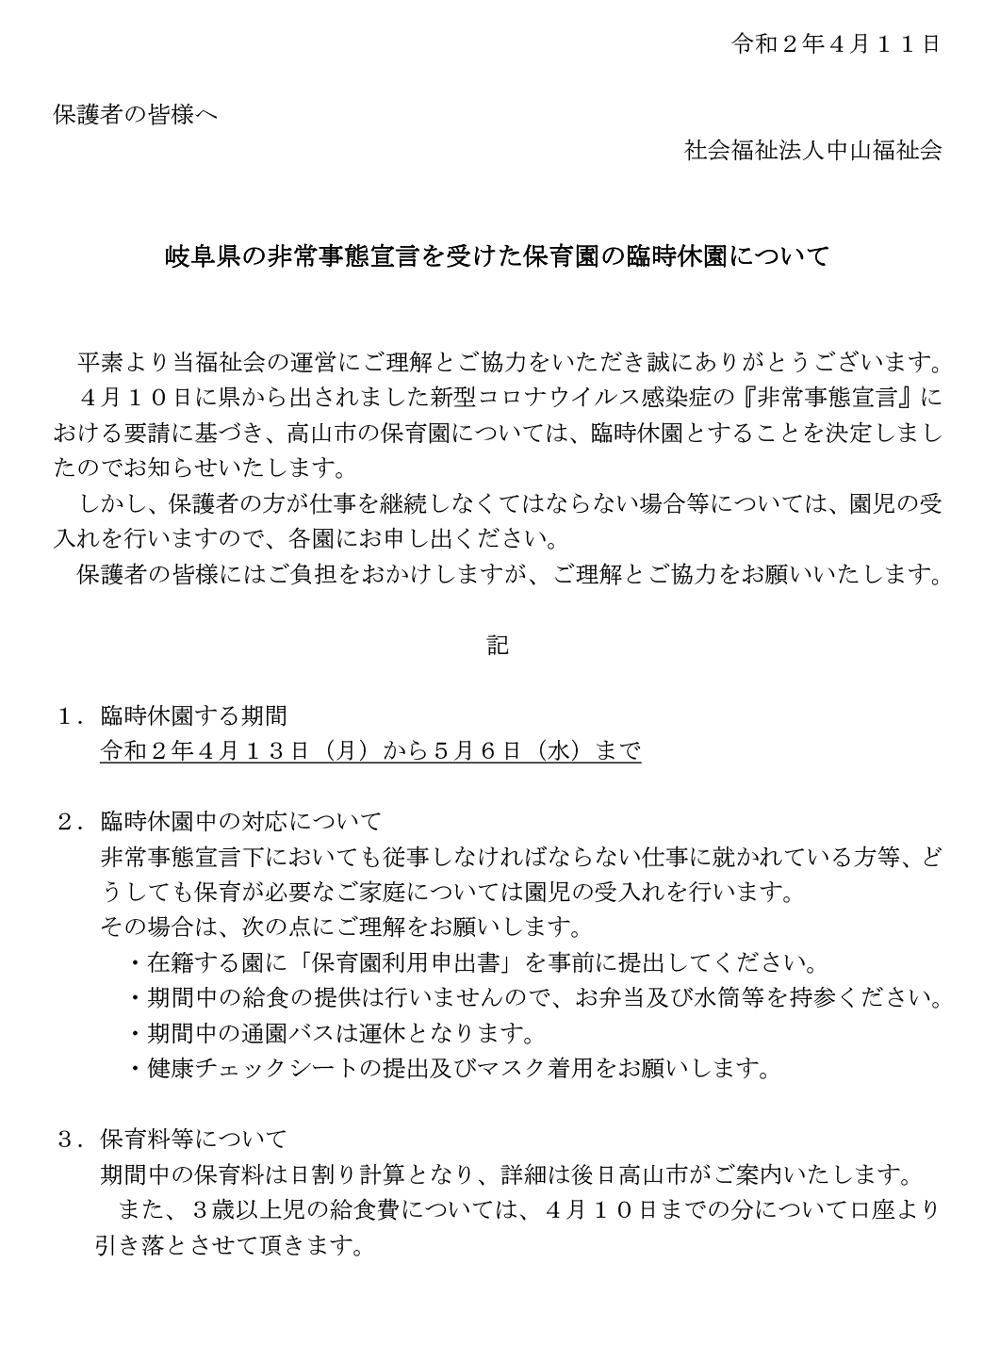 "<span class=""title"">岐阜県の非常事態宣言を受けた保育園の臨時休園について</span>"